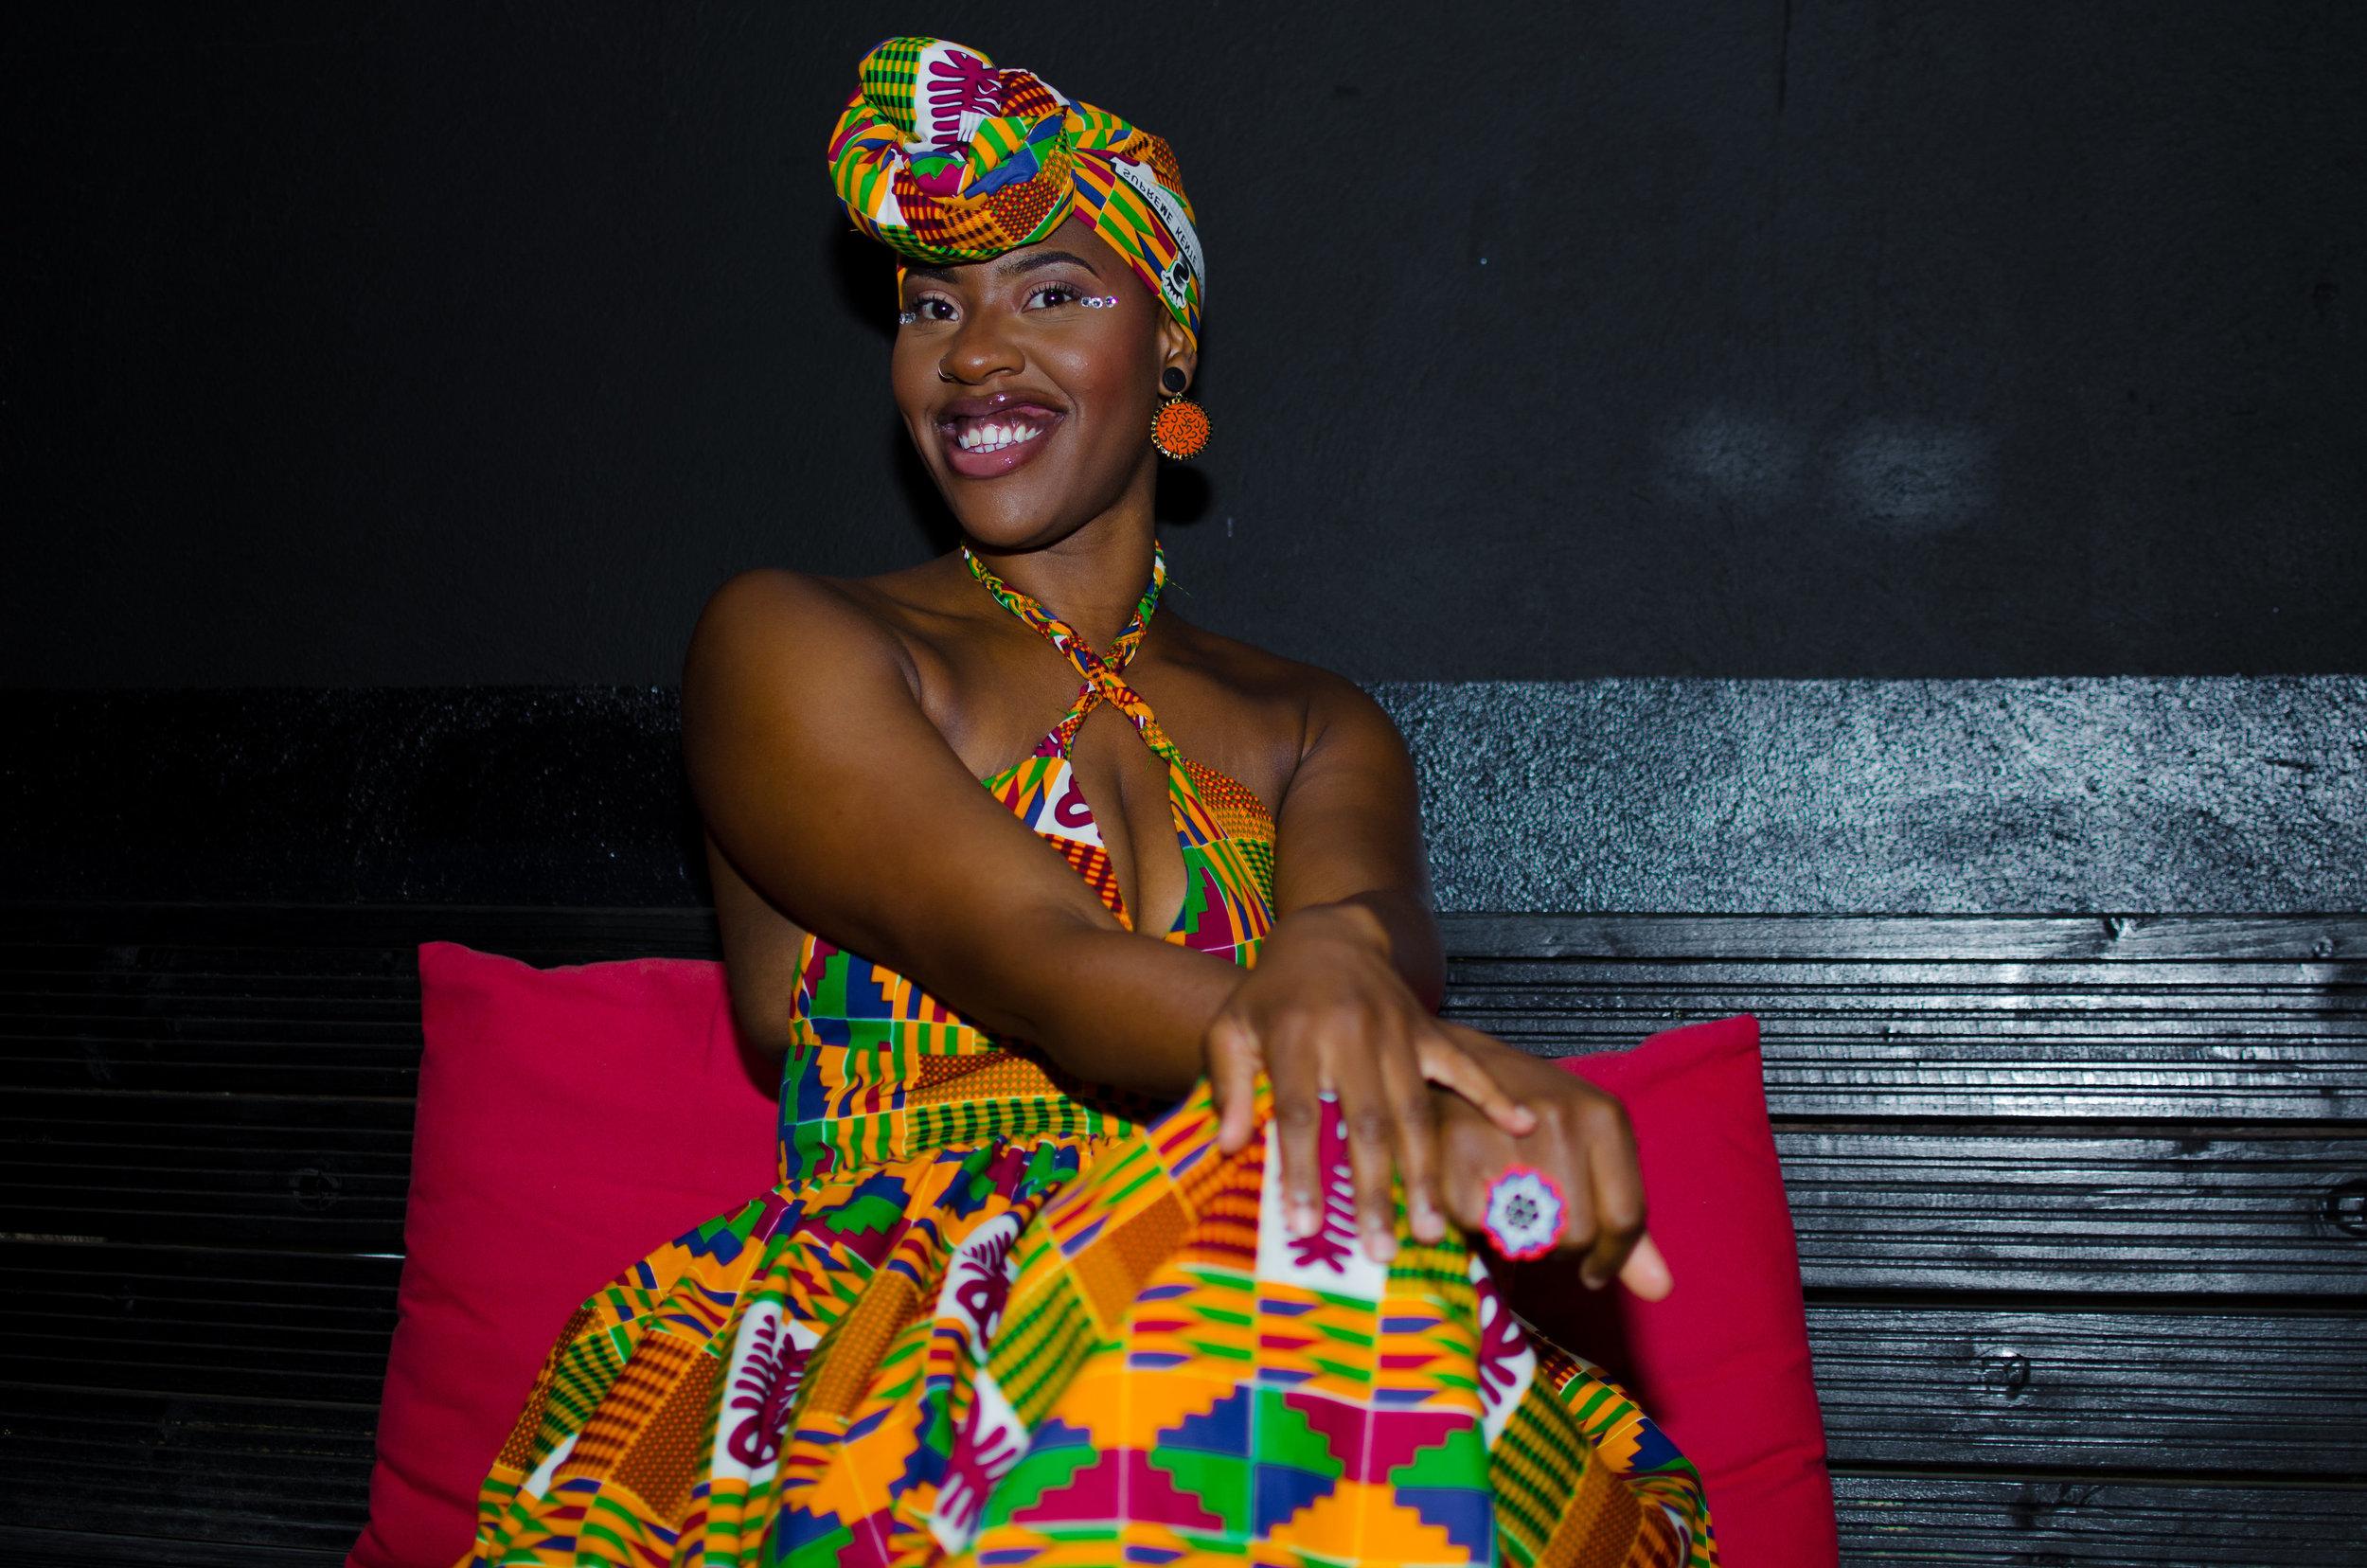 Shada'sAfrican-themed 30th birthday - Bespoke Kente dress